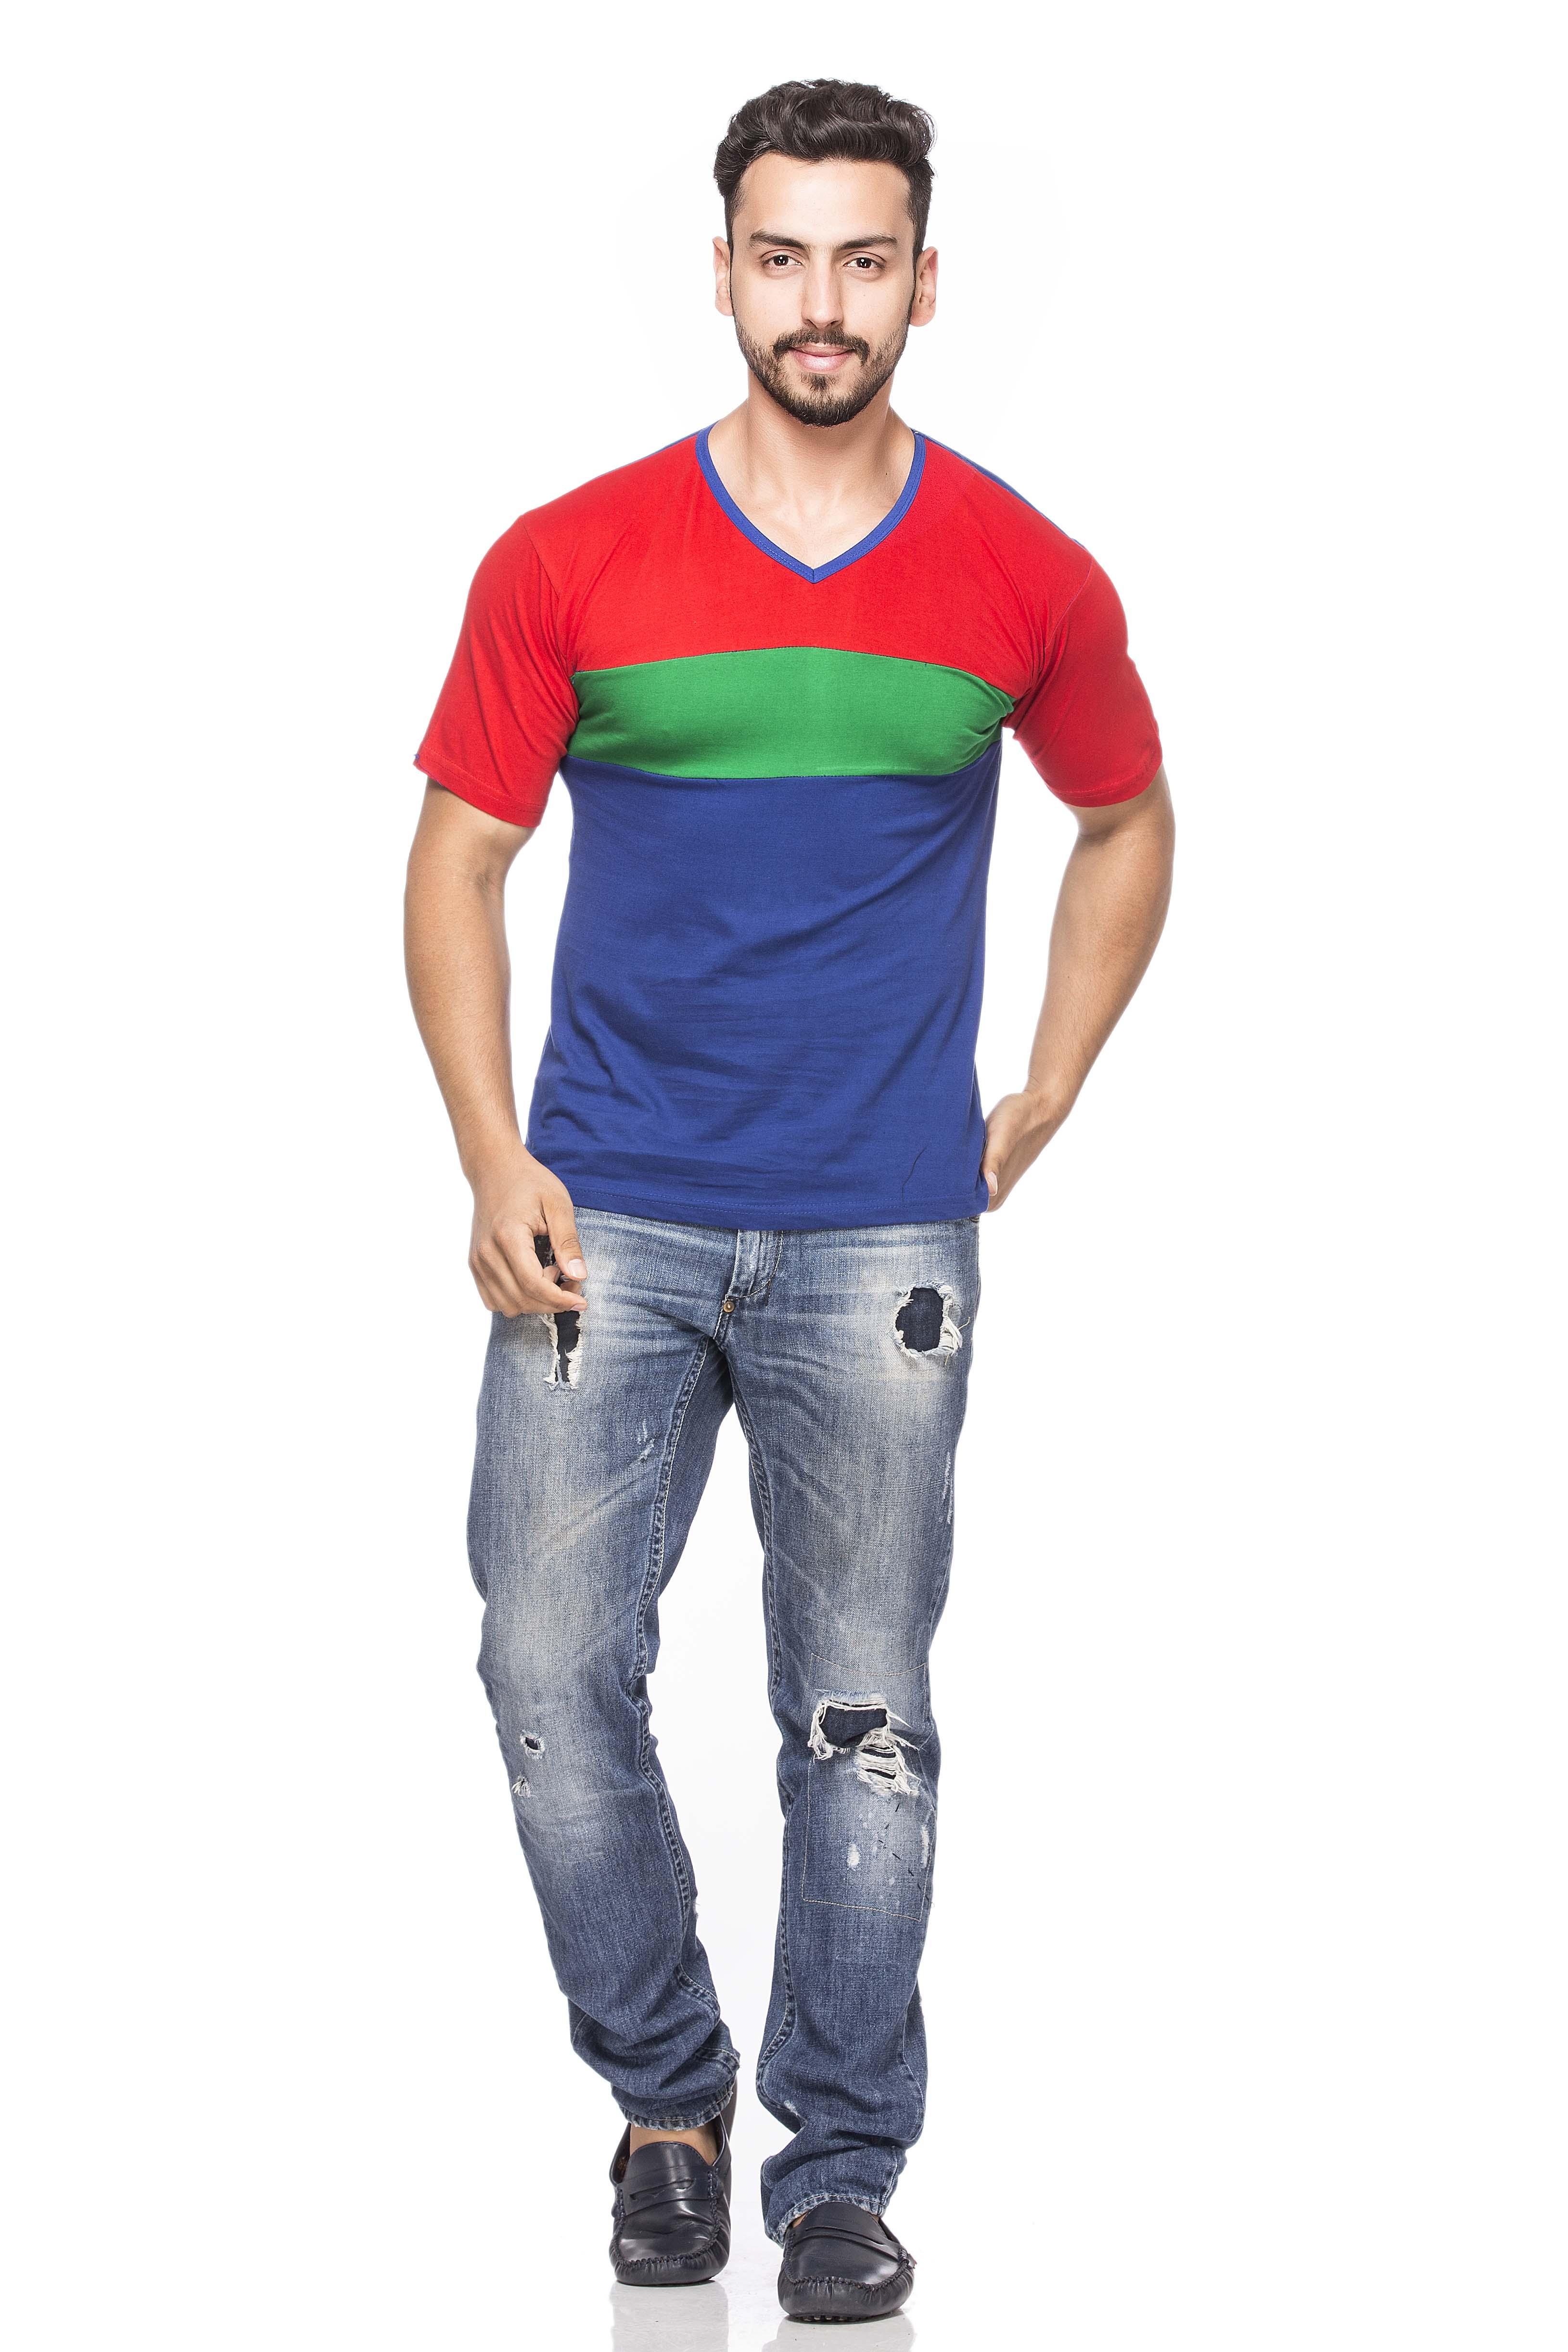 Black t shirt jabong - Demokrazy Half Sleeve T Shirt For Men 7848464 Available At Shopclues For Rs 199